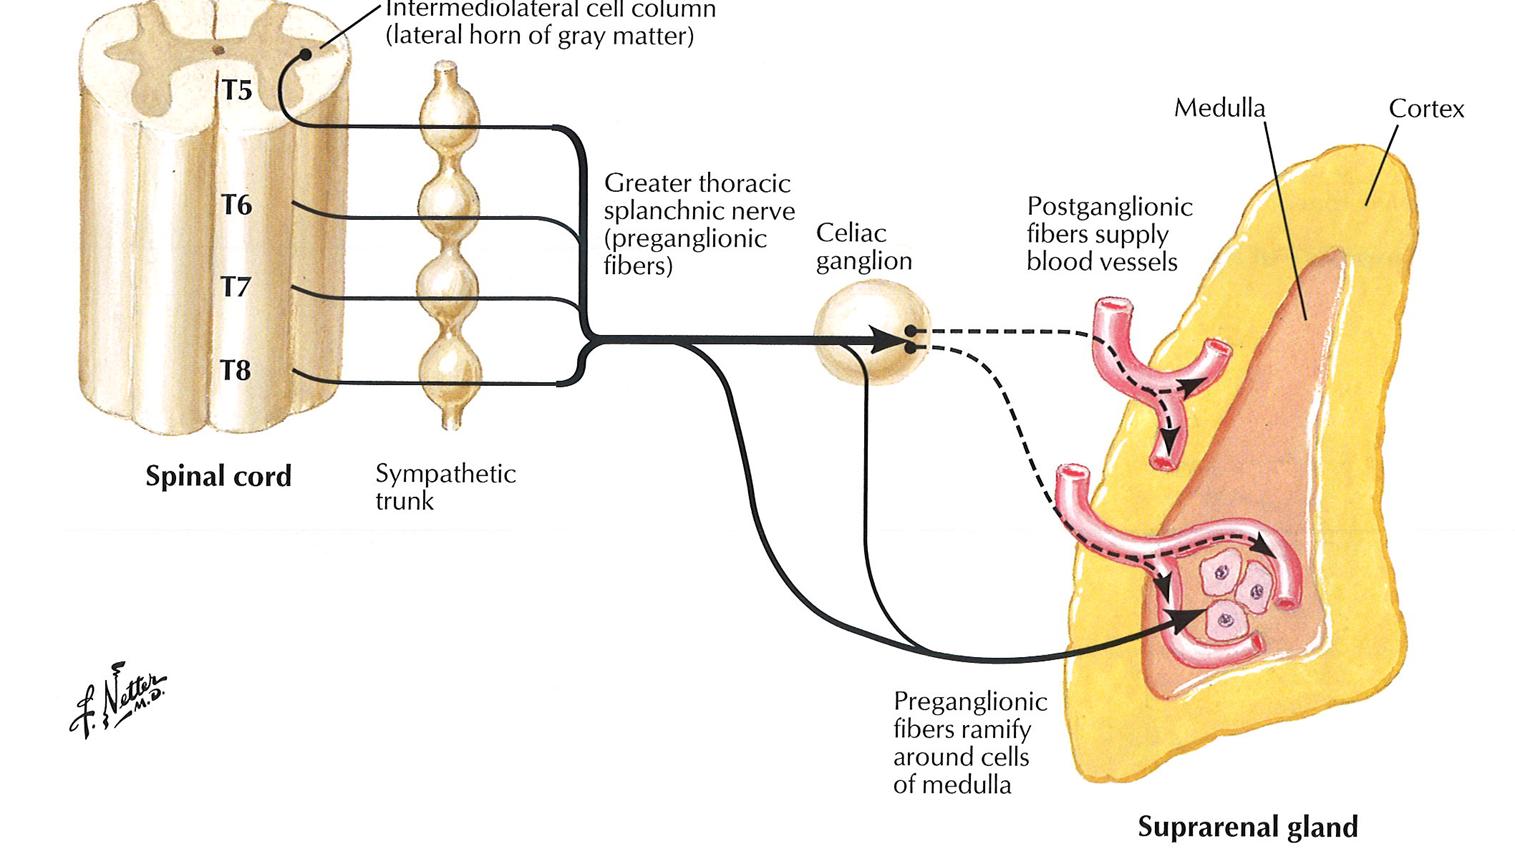 019b Kidneys Ureters Adrenal Glands Anatomy Flashcards Memorang